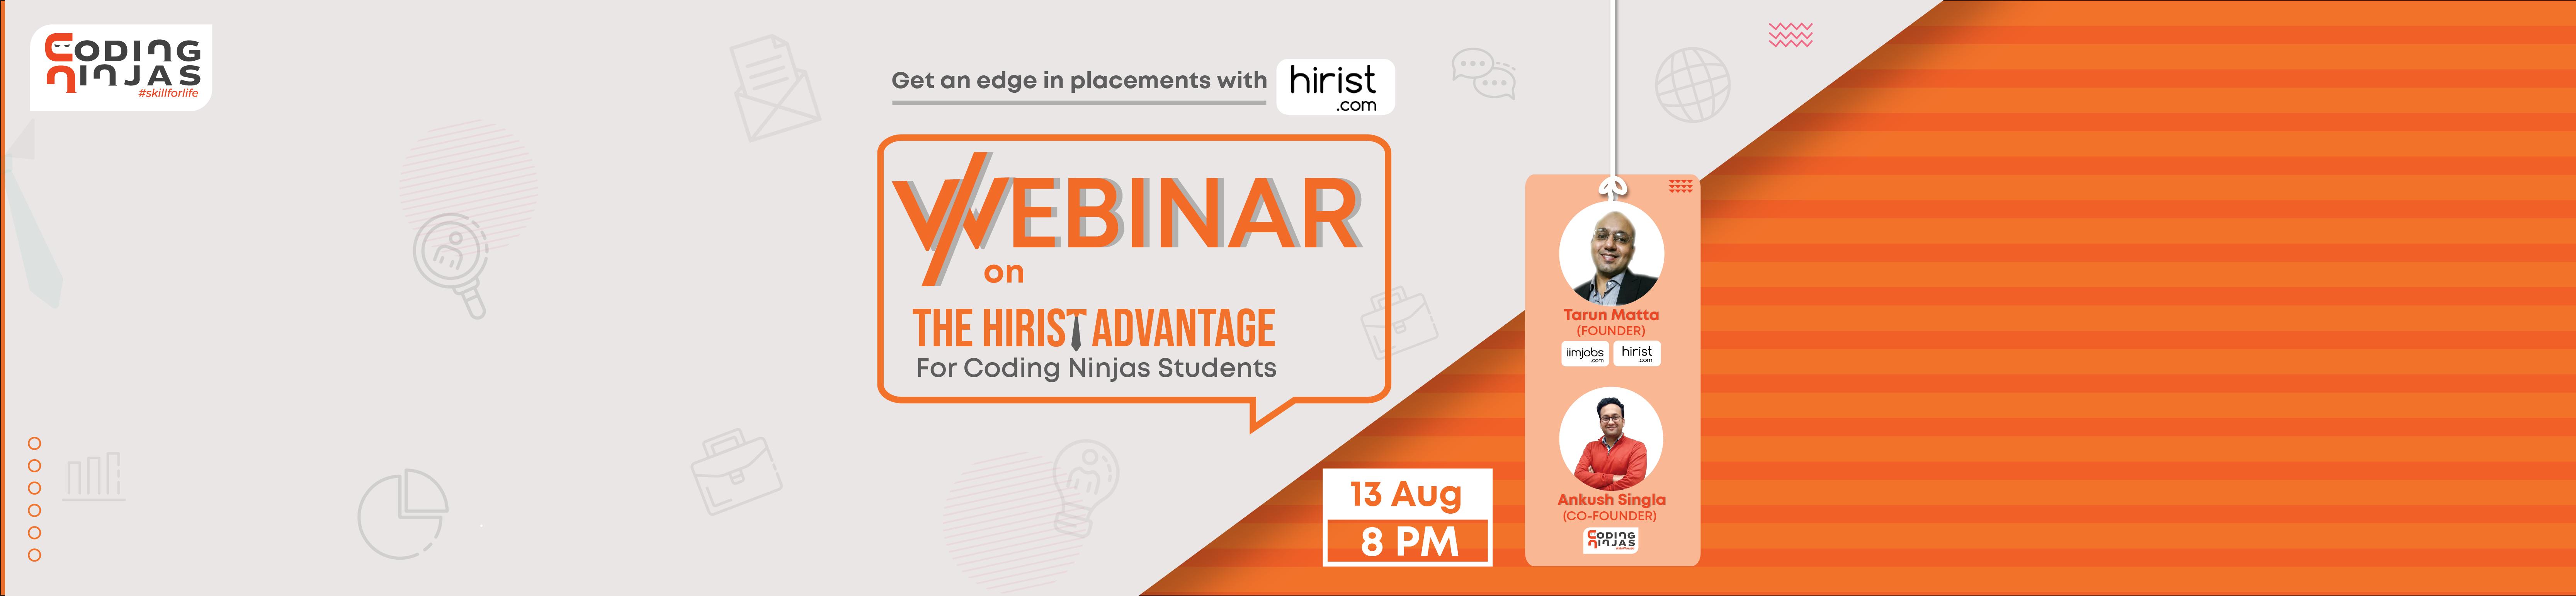 The Hirist Advantage for Coding Ninjas Students